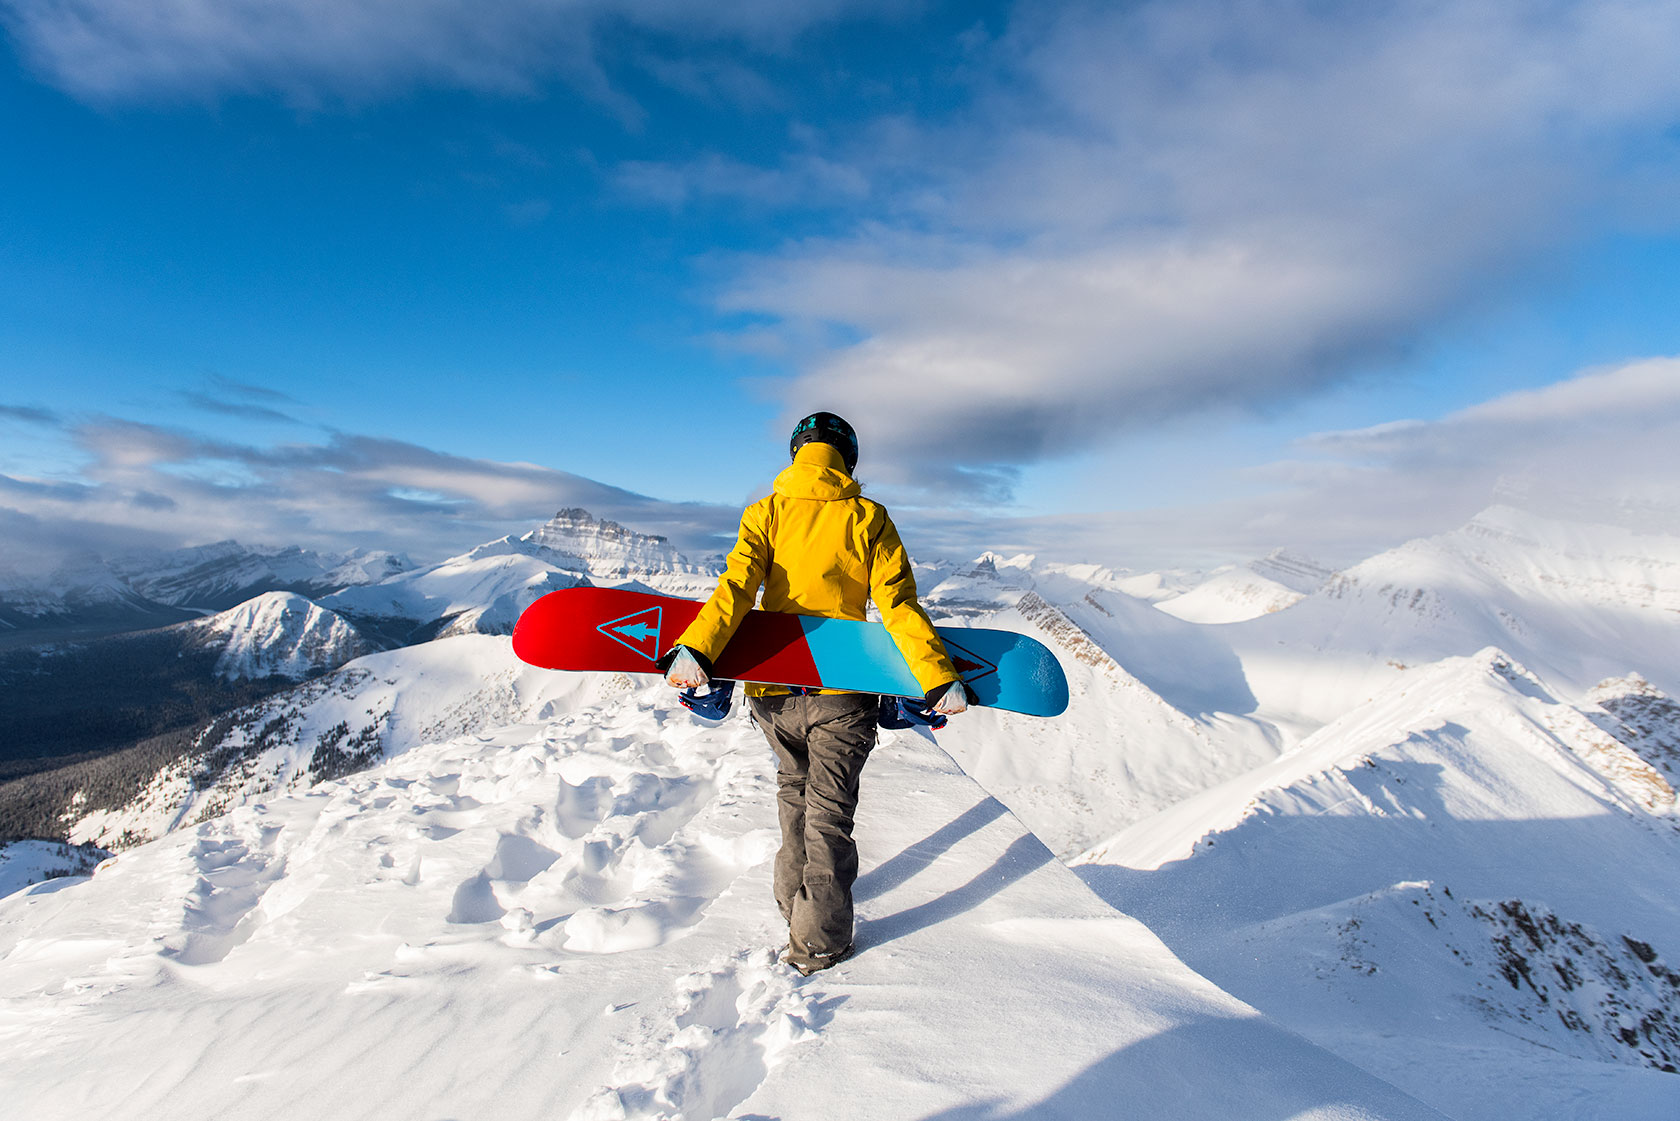 austin-trigg-patagonia-banff-alberta-winter-canada-lifestyle-adventure-mountains-lake-louise-boot-pack-adventure-backcountry.jpg